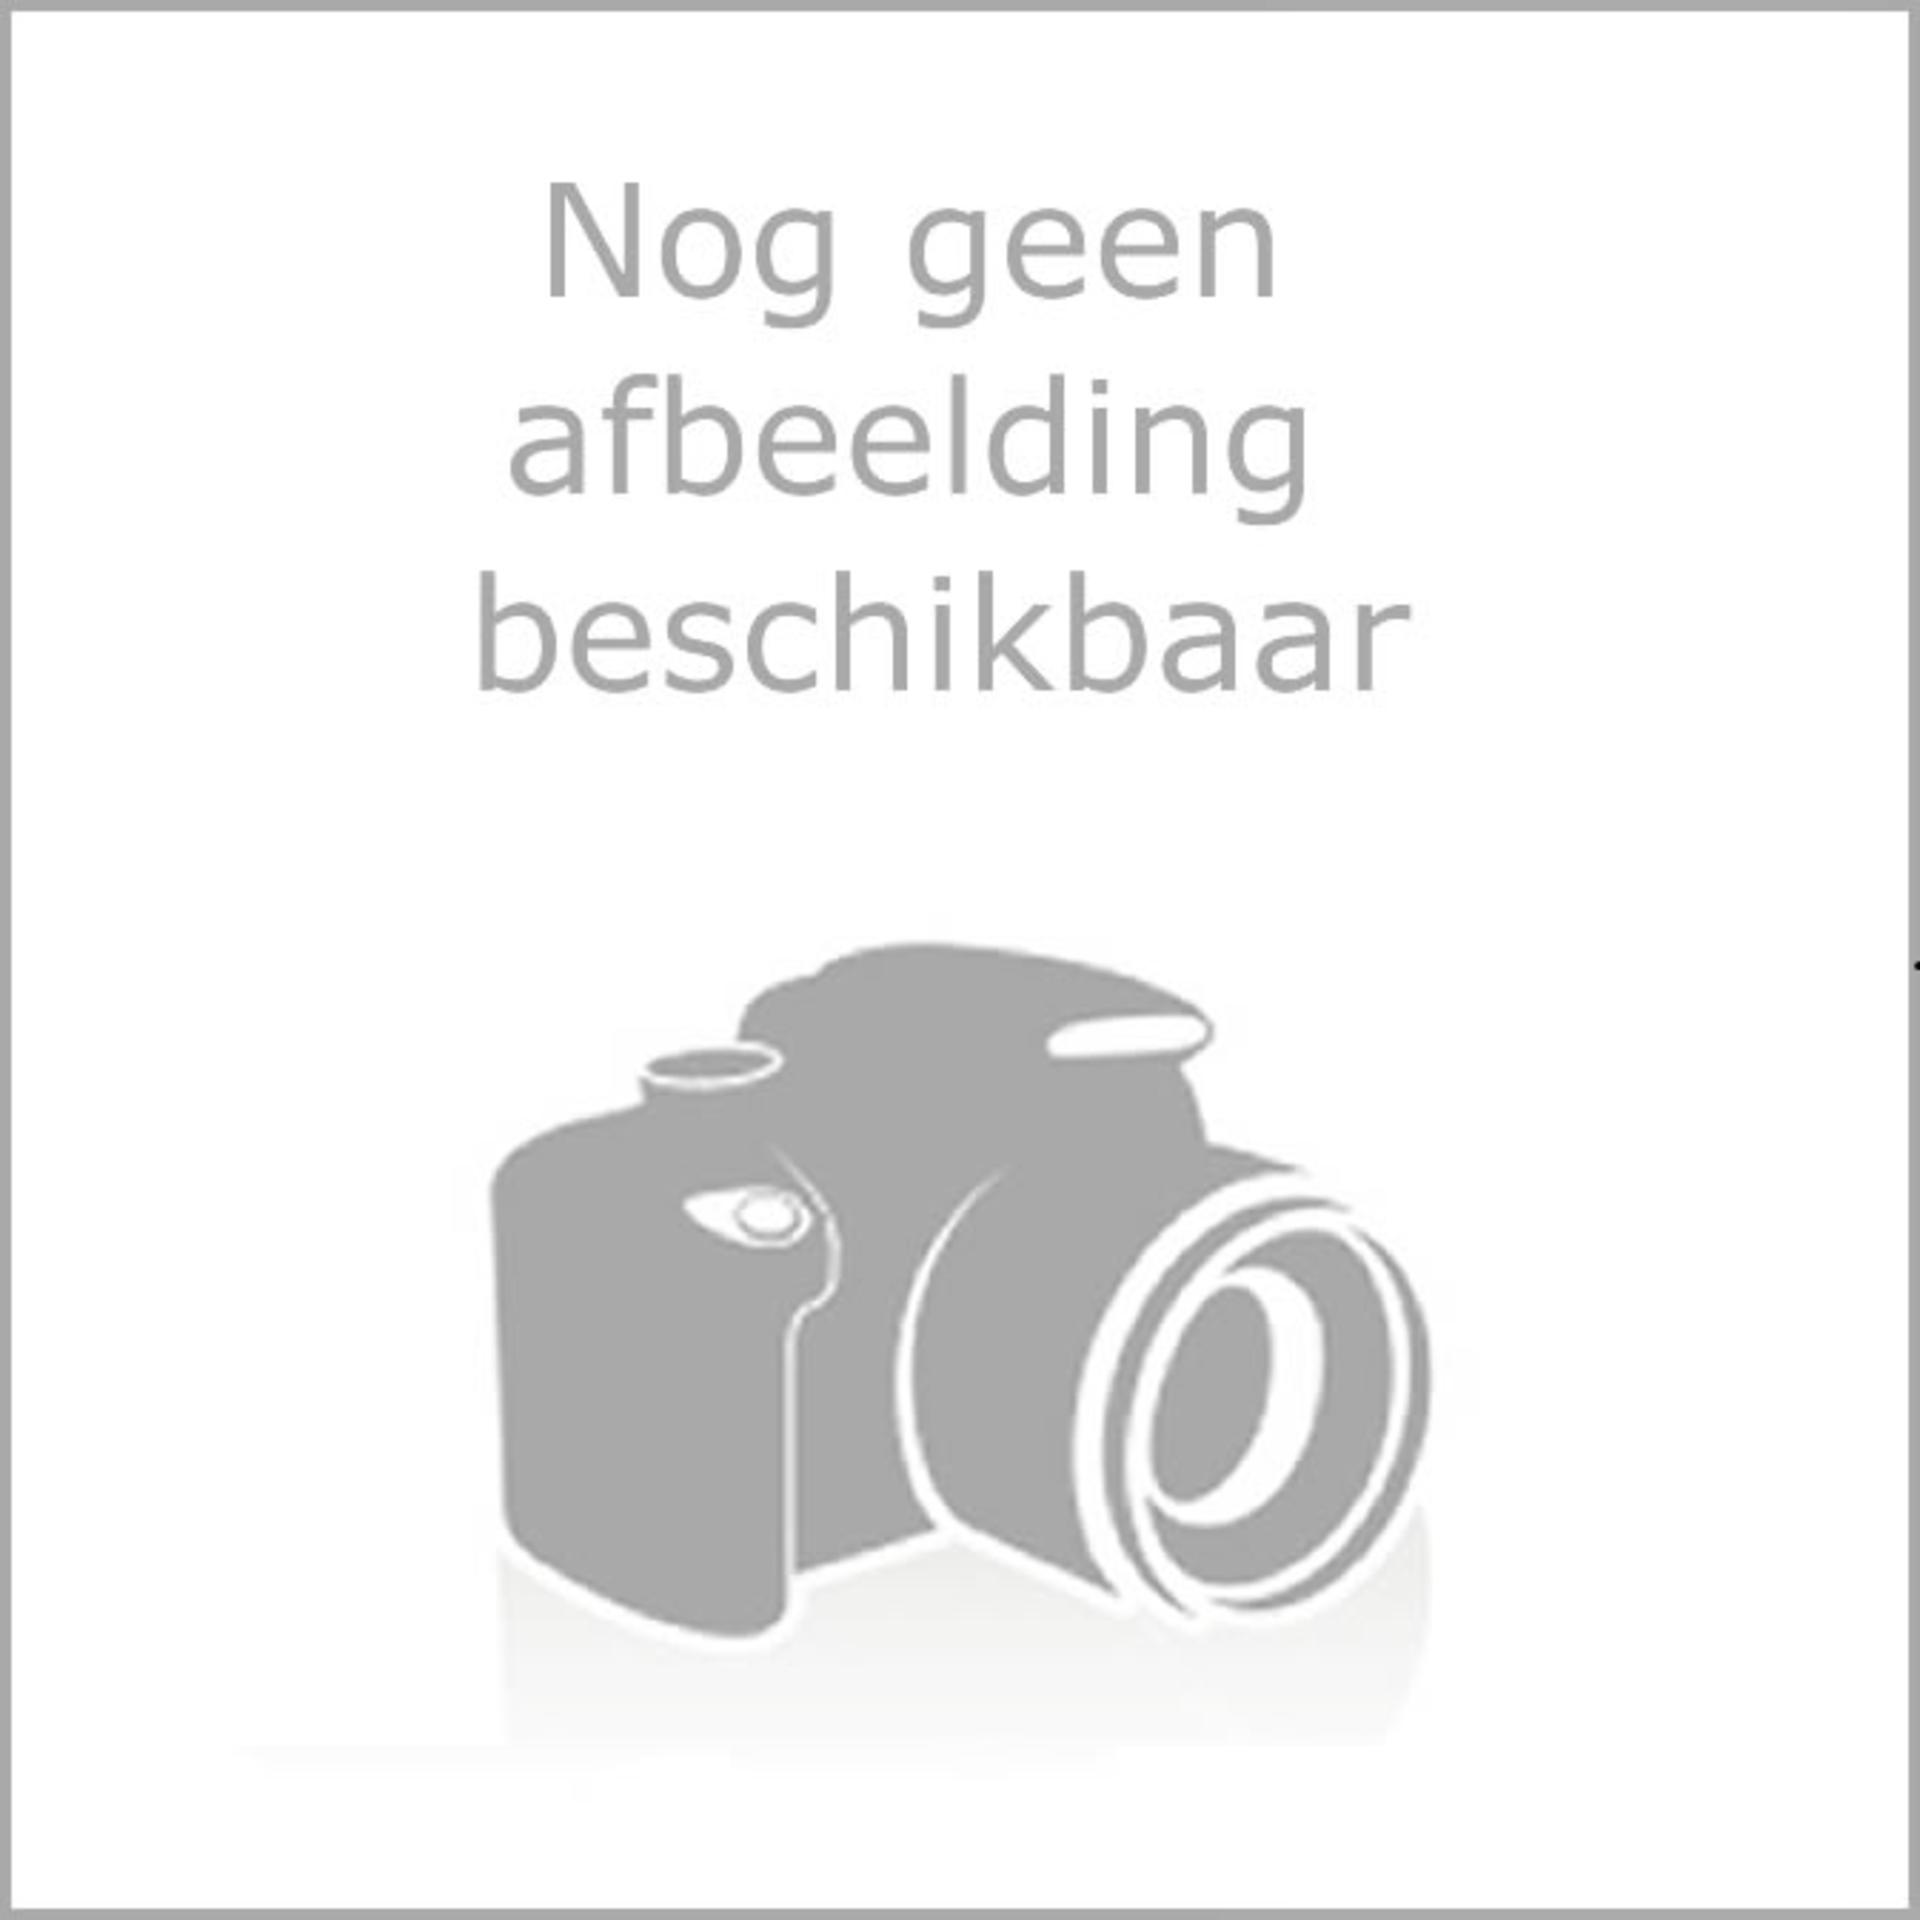 Kleine Hoekbank Stof.Topform Hoekbank Made For You In Stof